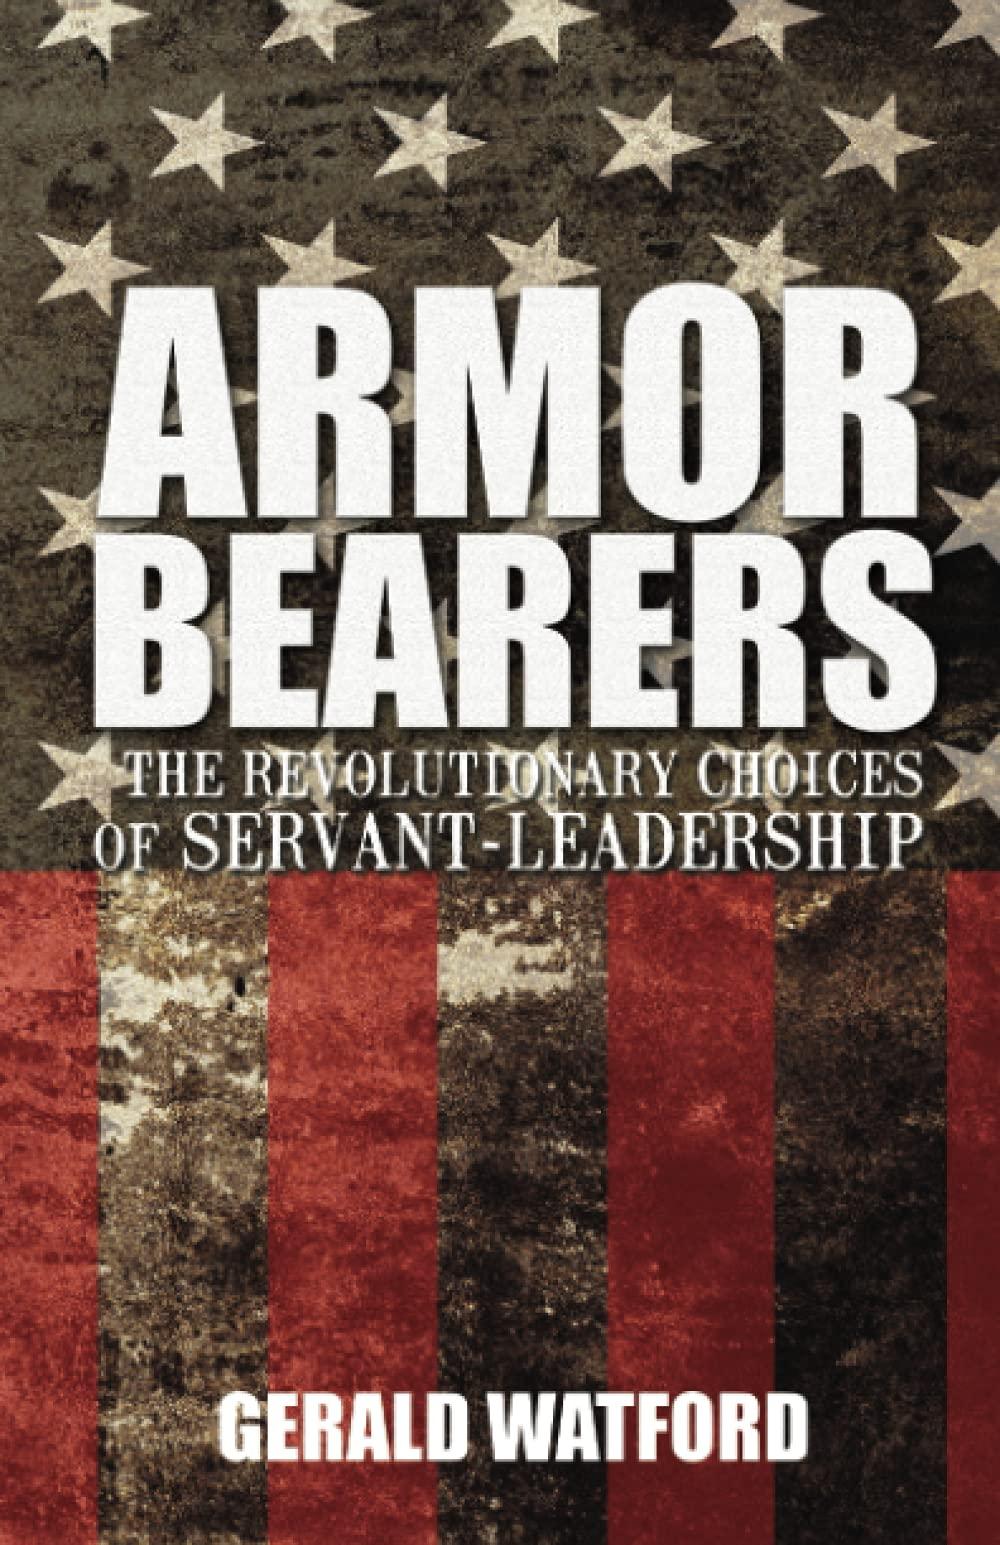 Armorbearers: The Revolutionary Choices of Servant-Leadership: Watford, Gerald: 9781620202999: Amazon.com: Books